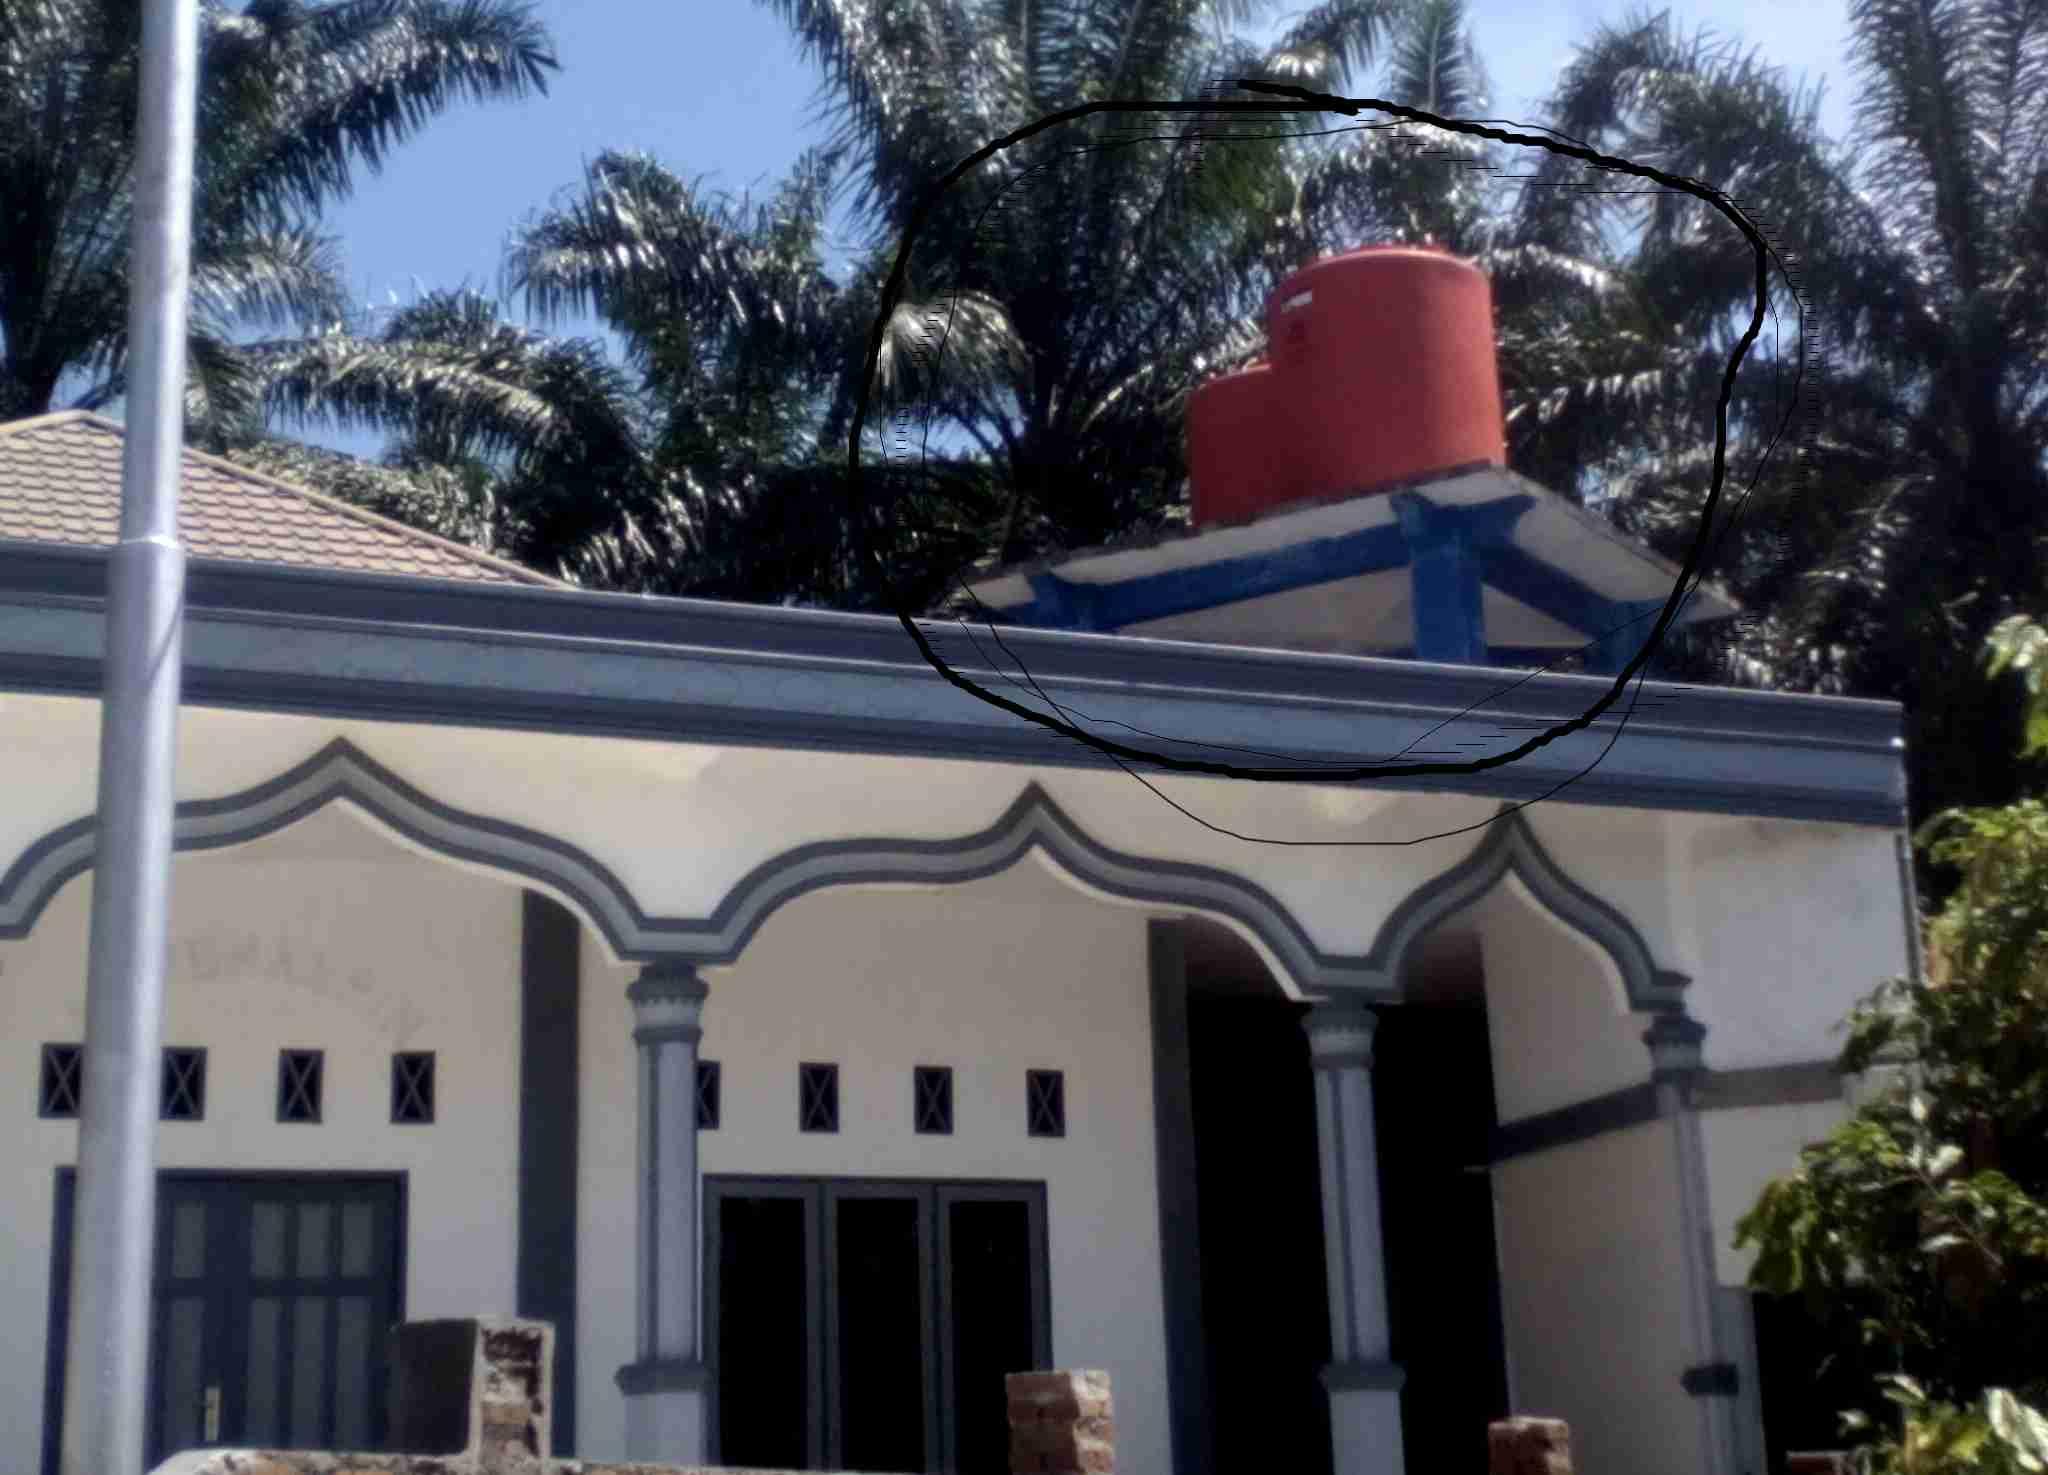 Pengerjaan Proyek Sumur Bor TA 2013/2014 Di Desa Nagahuta Diduga Sarat Unsur Korupsi